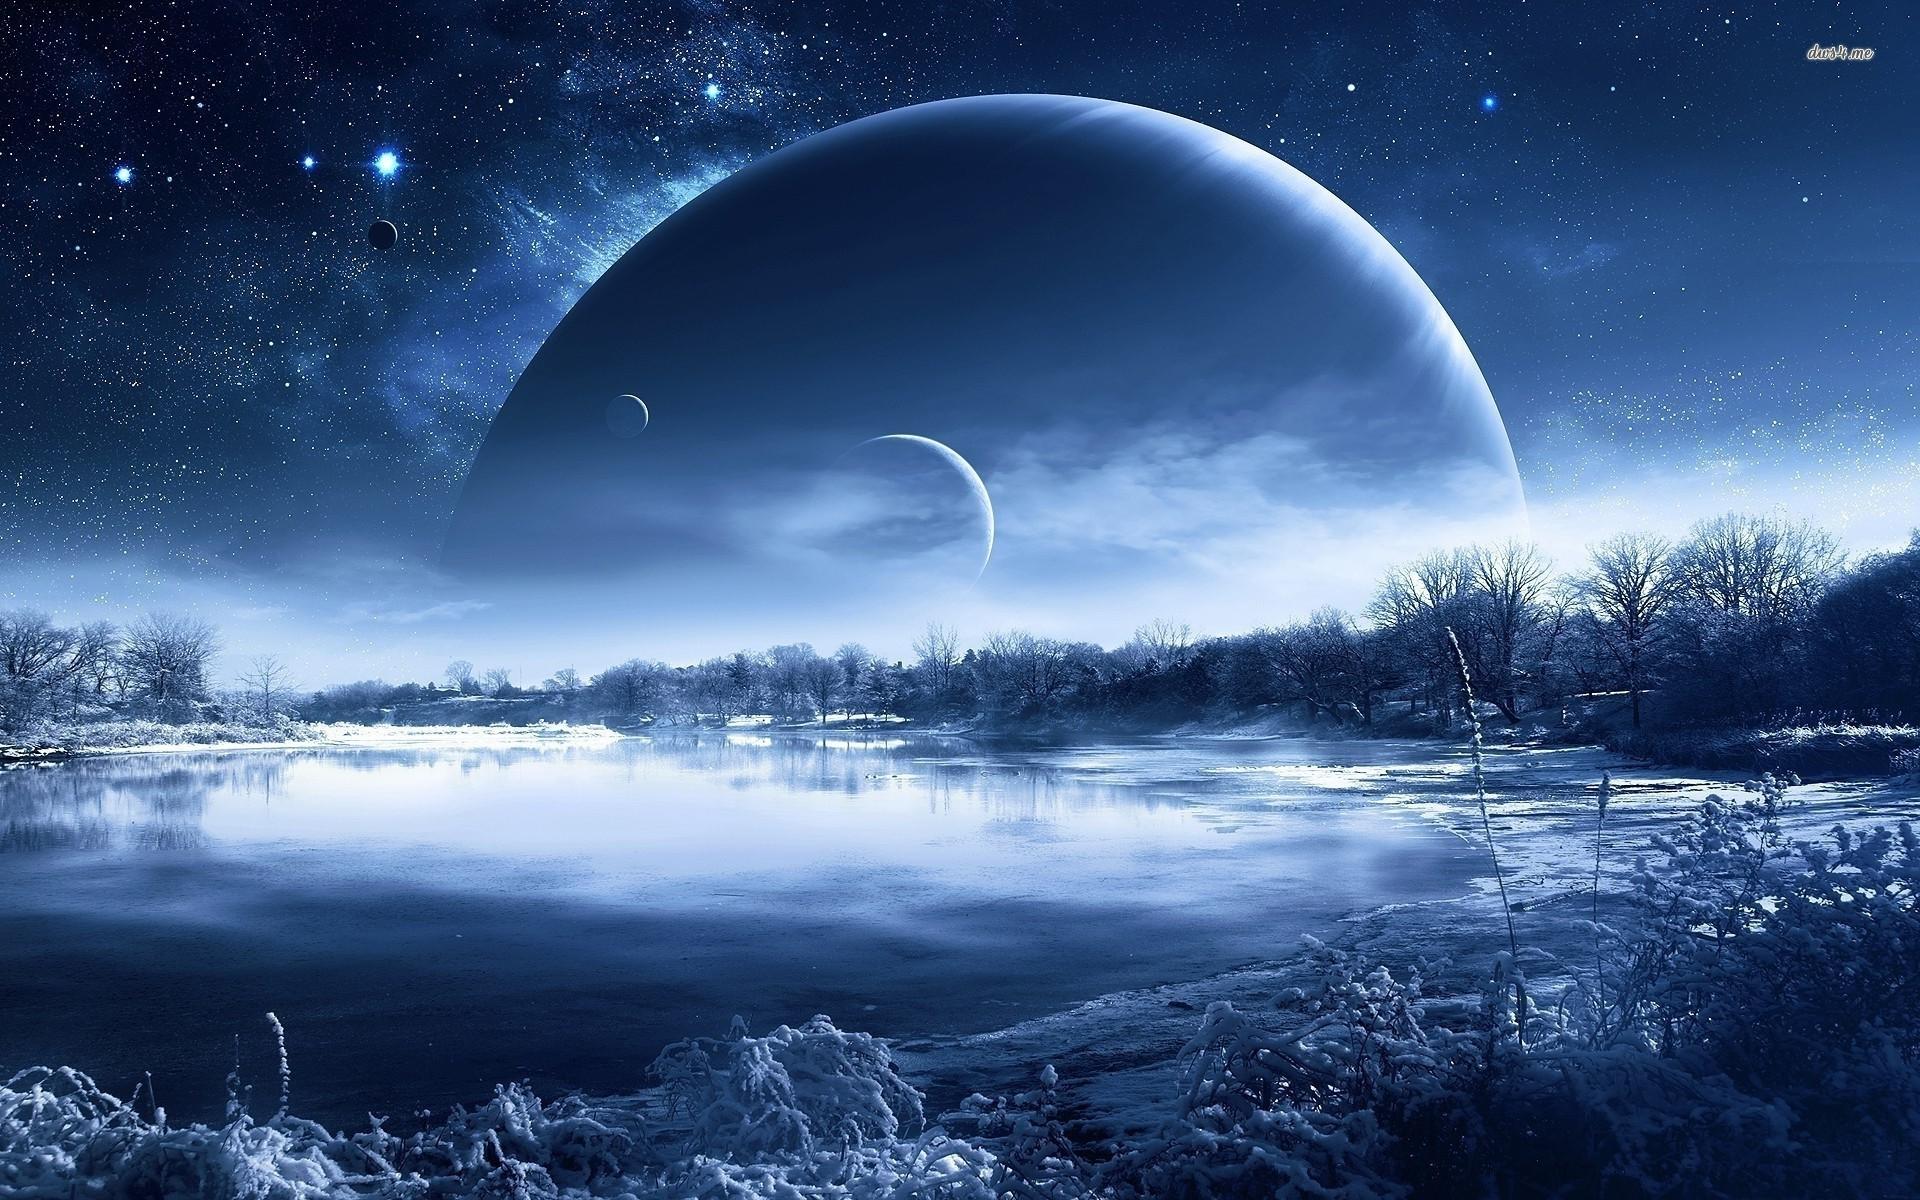 Icy planet landscape